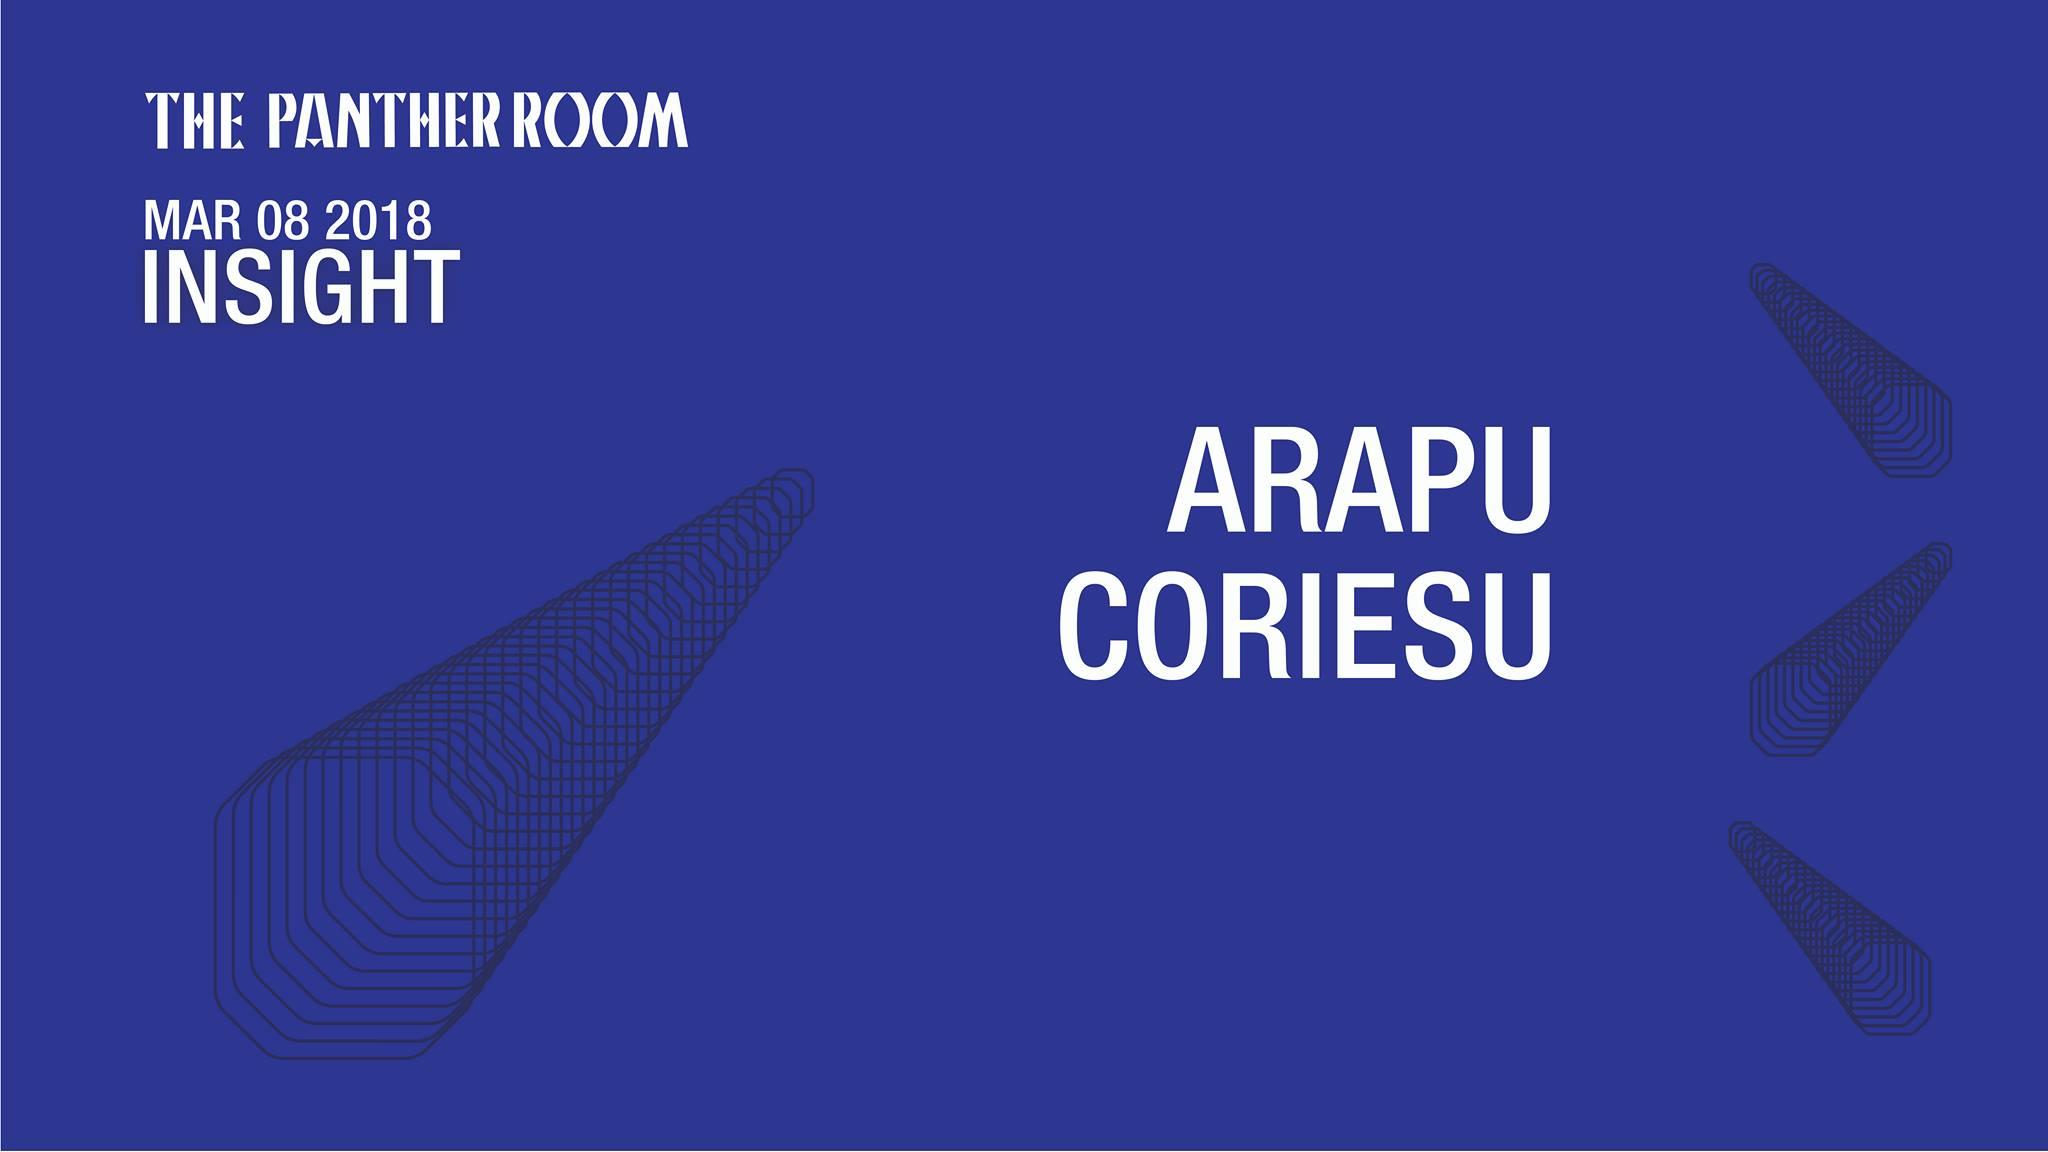 arapu Output Robbie Lumpkin Promotions